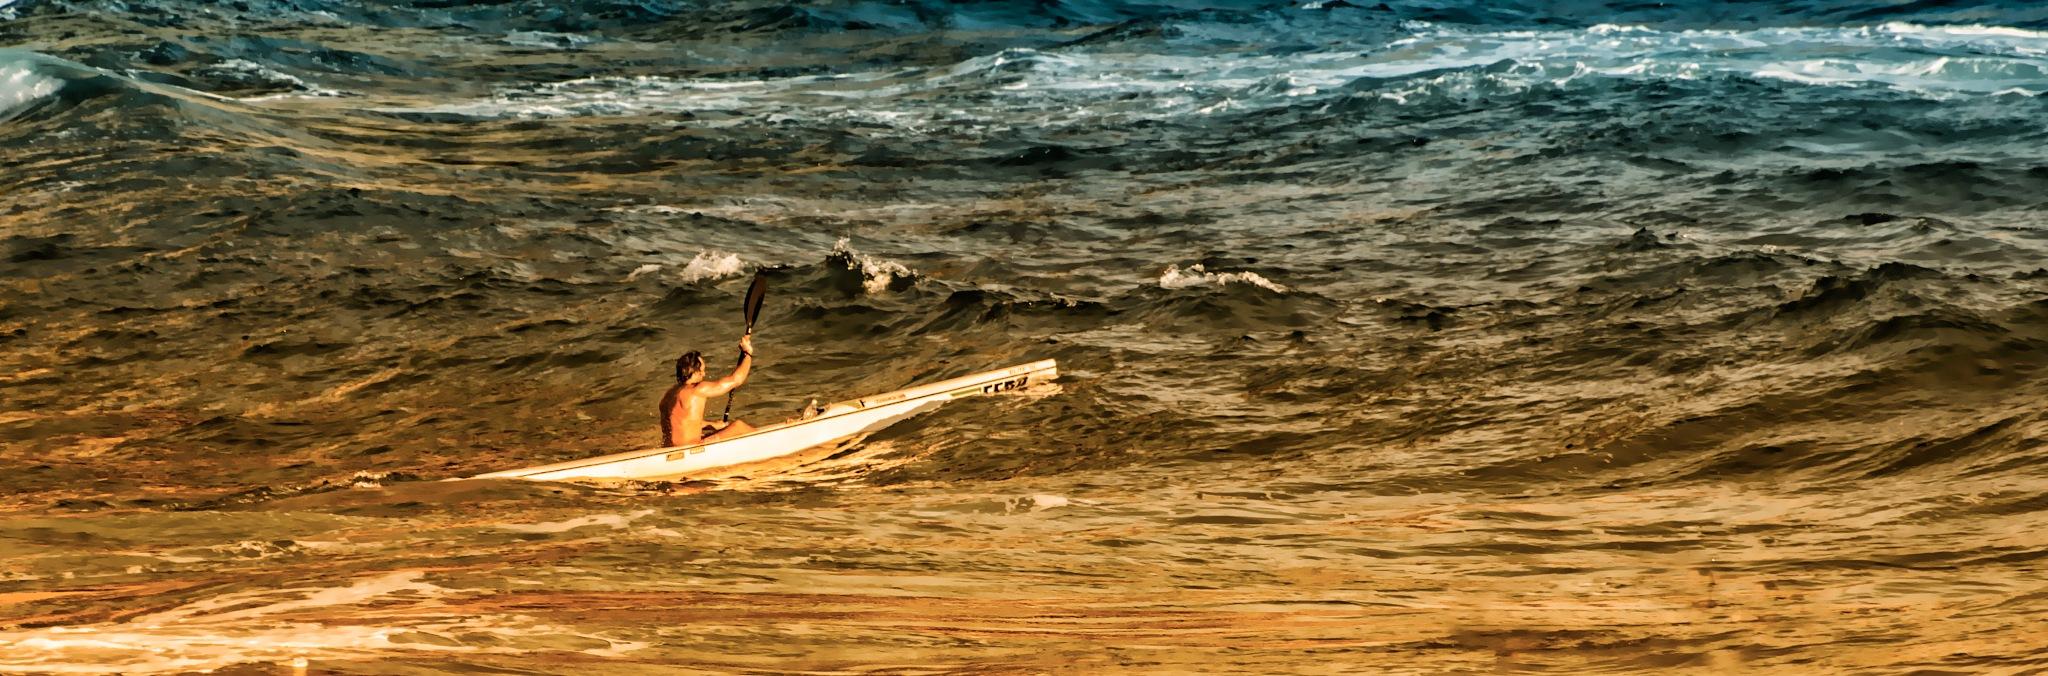 canoe in the seastorm by sunrisesunset